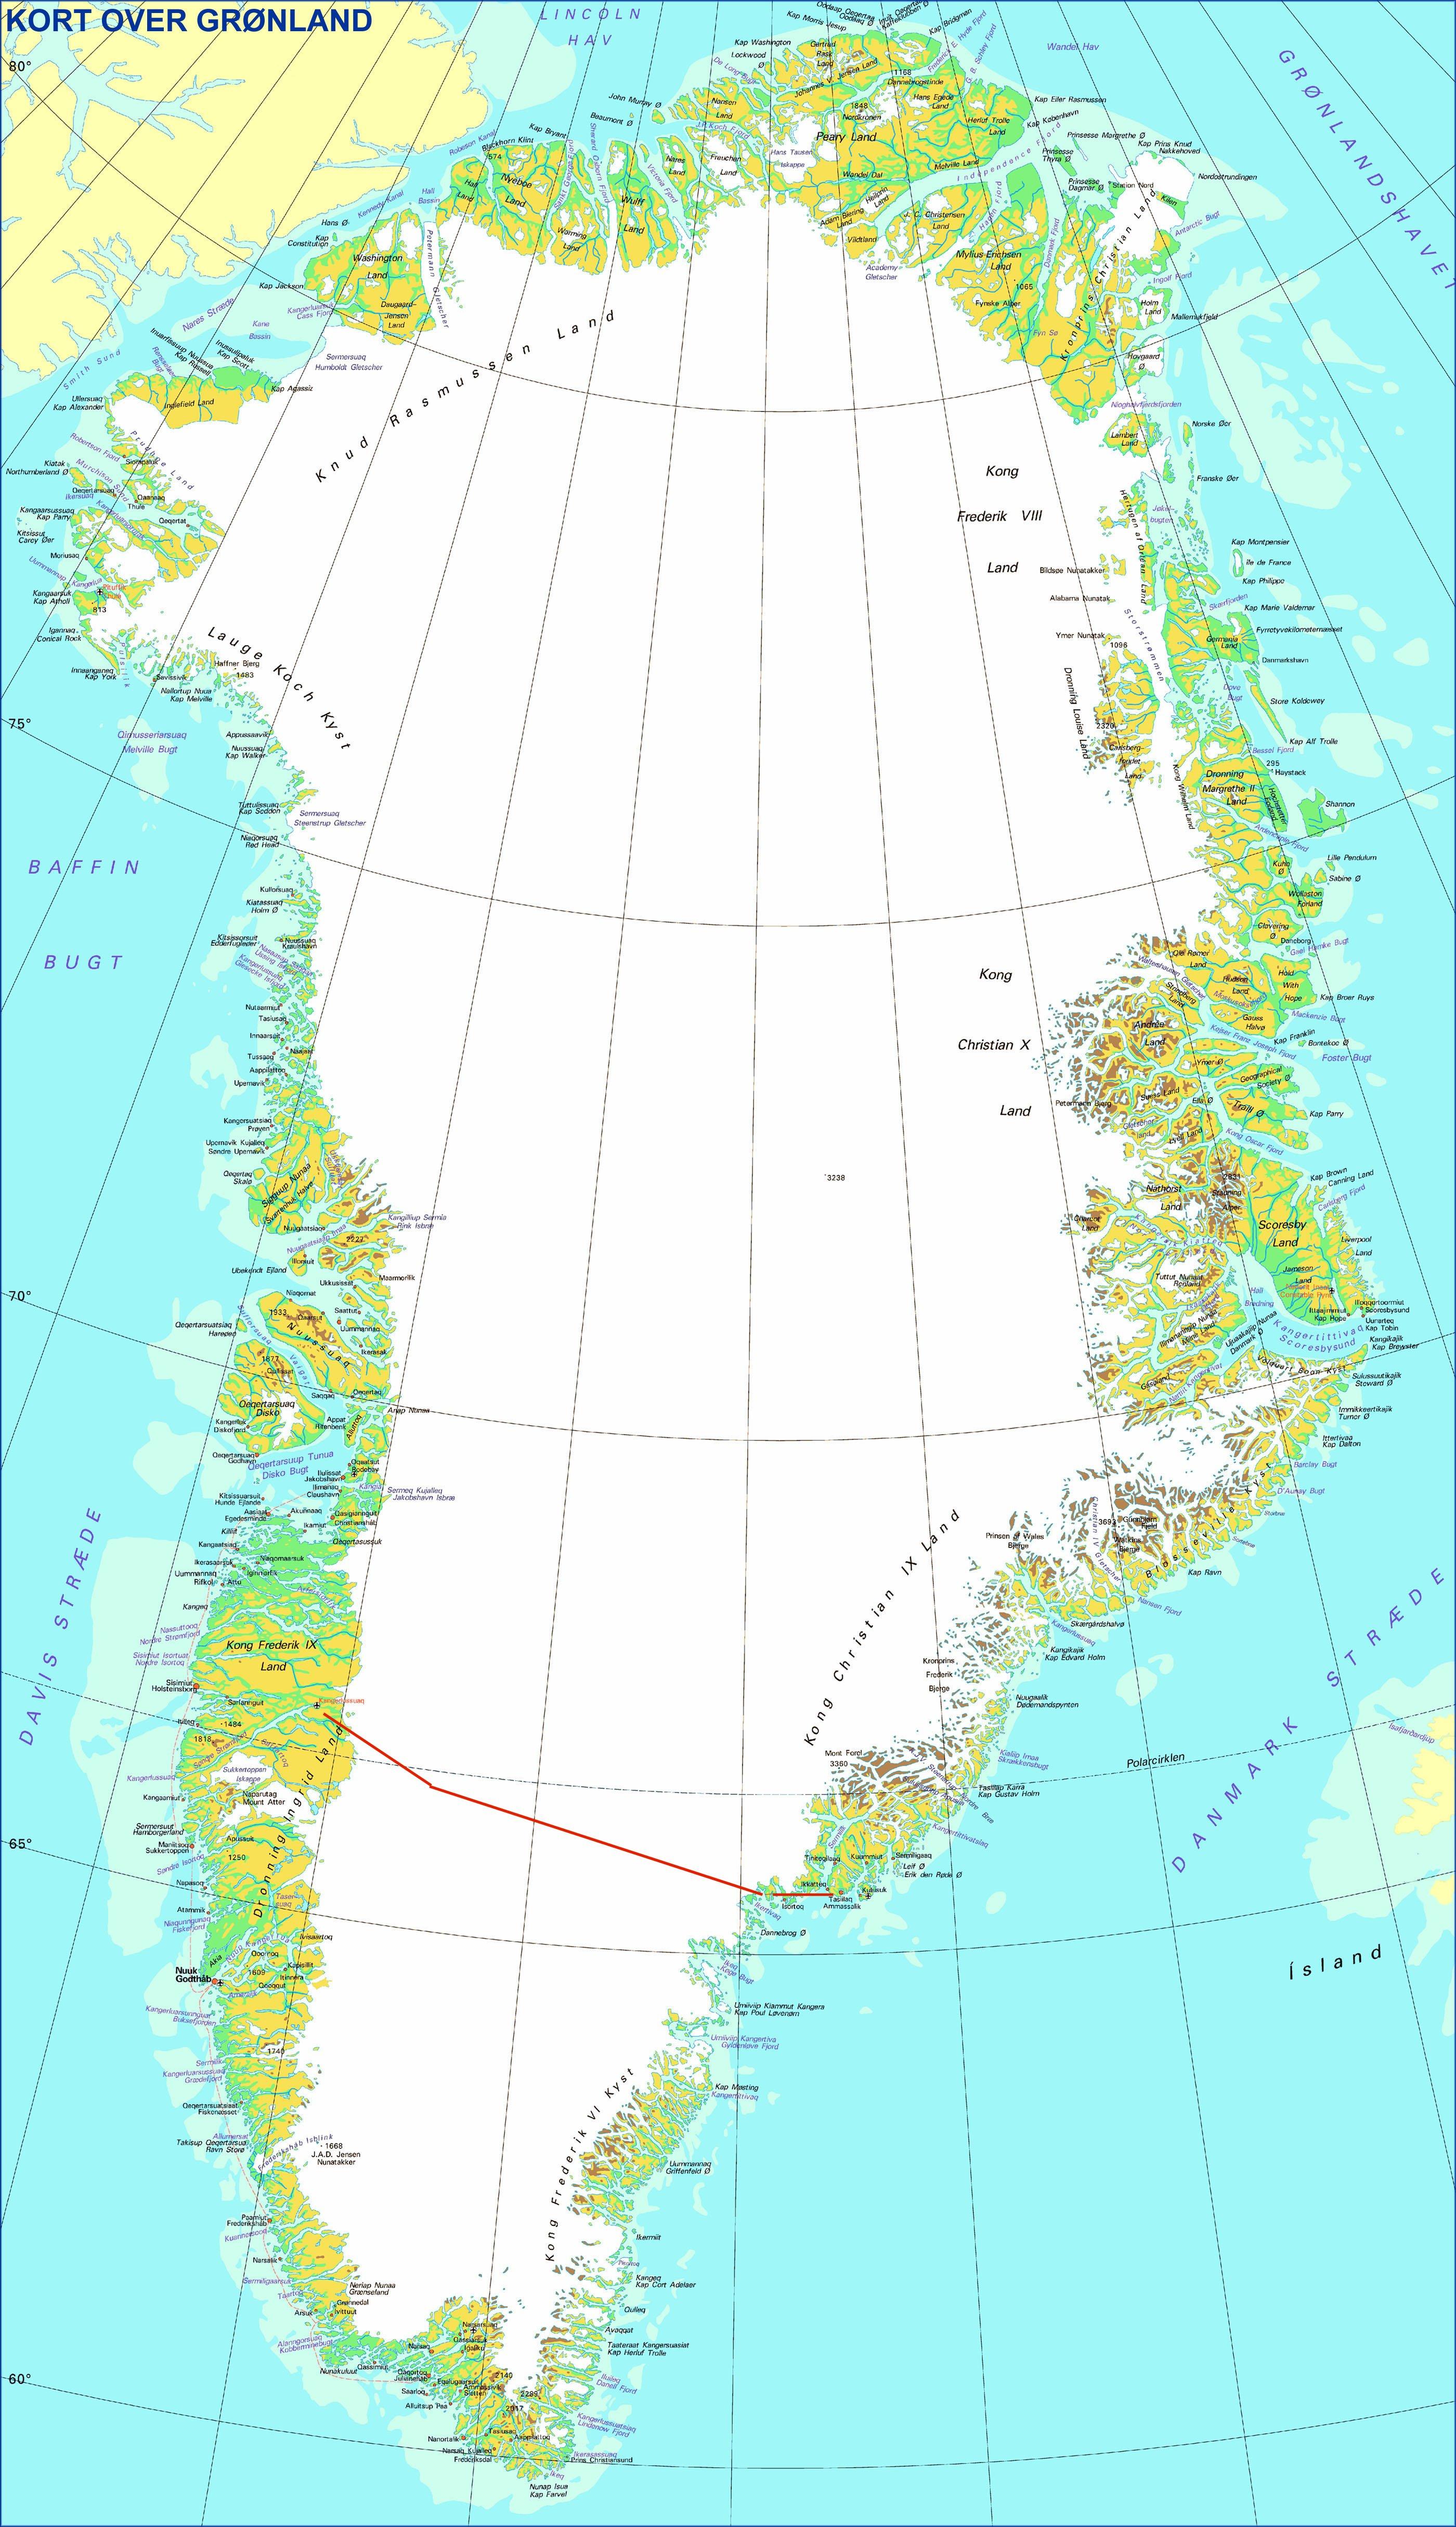 kart grønland index.html kart grønland